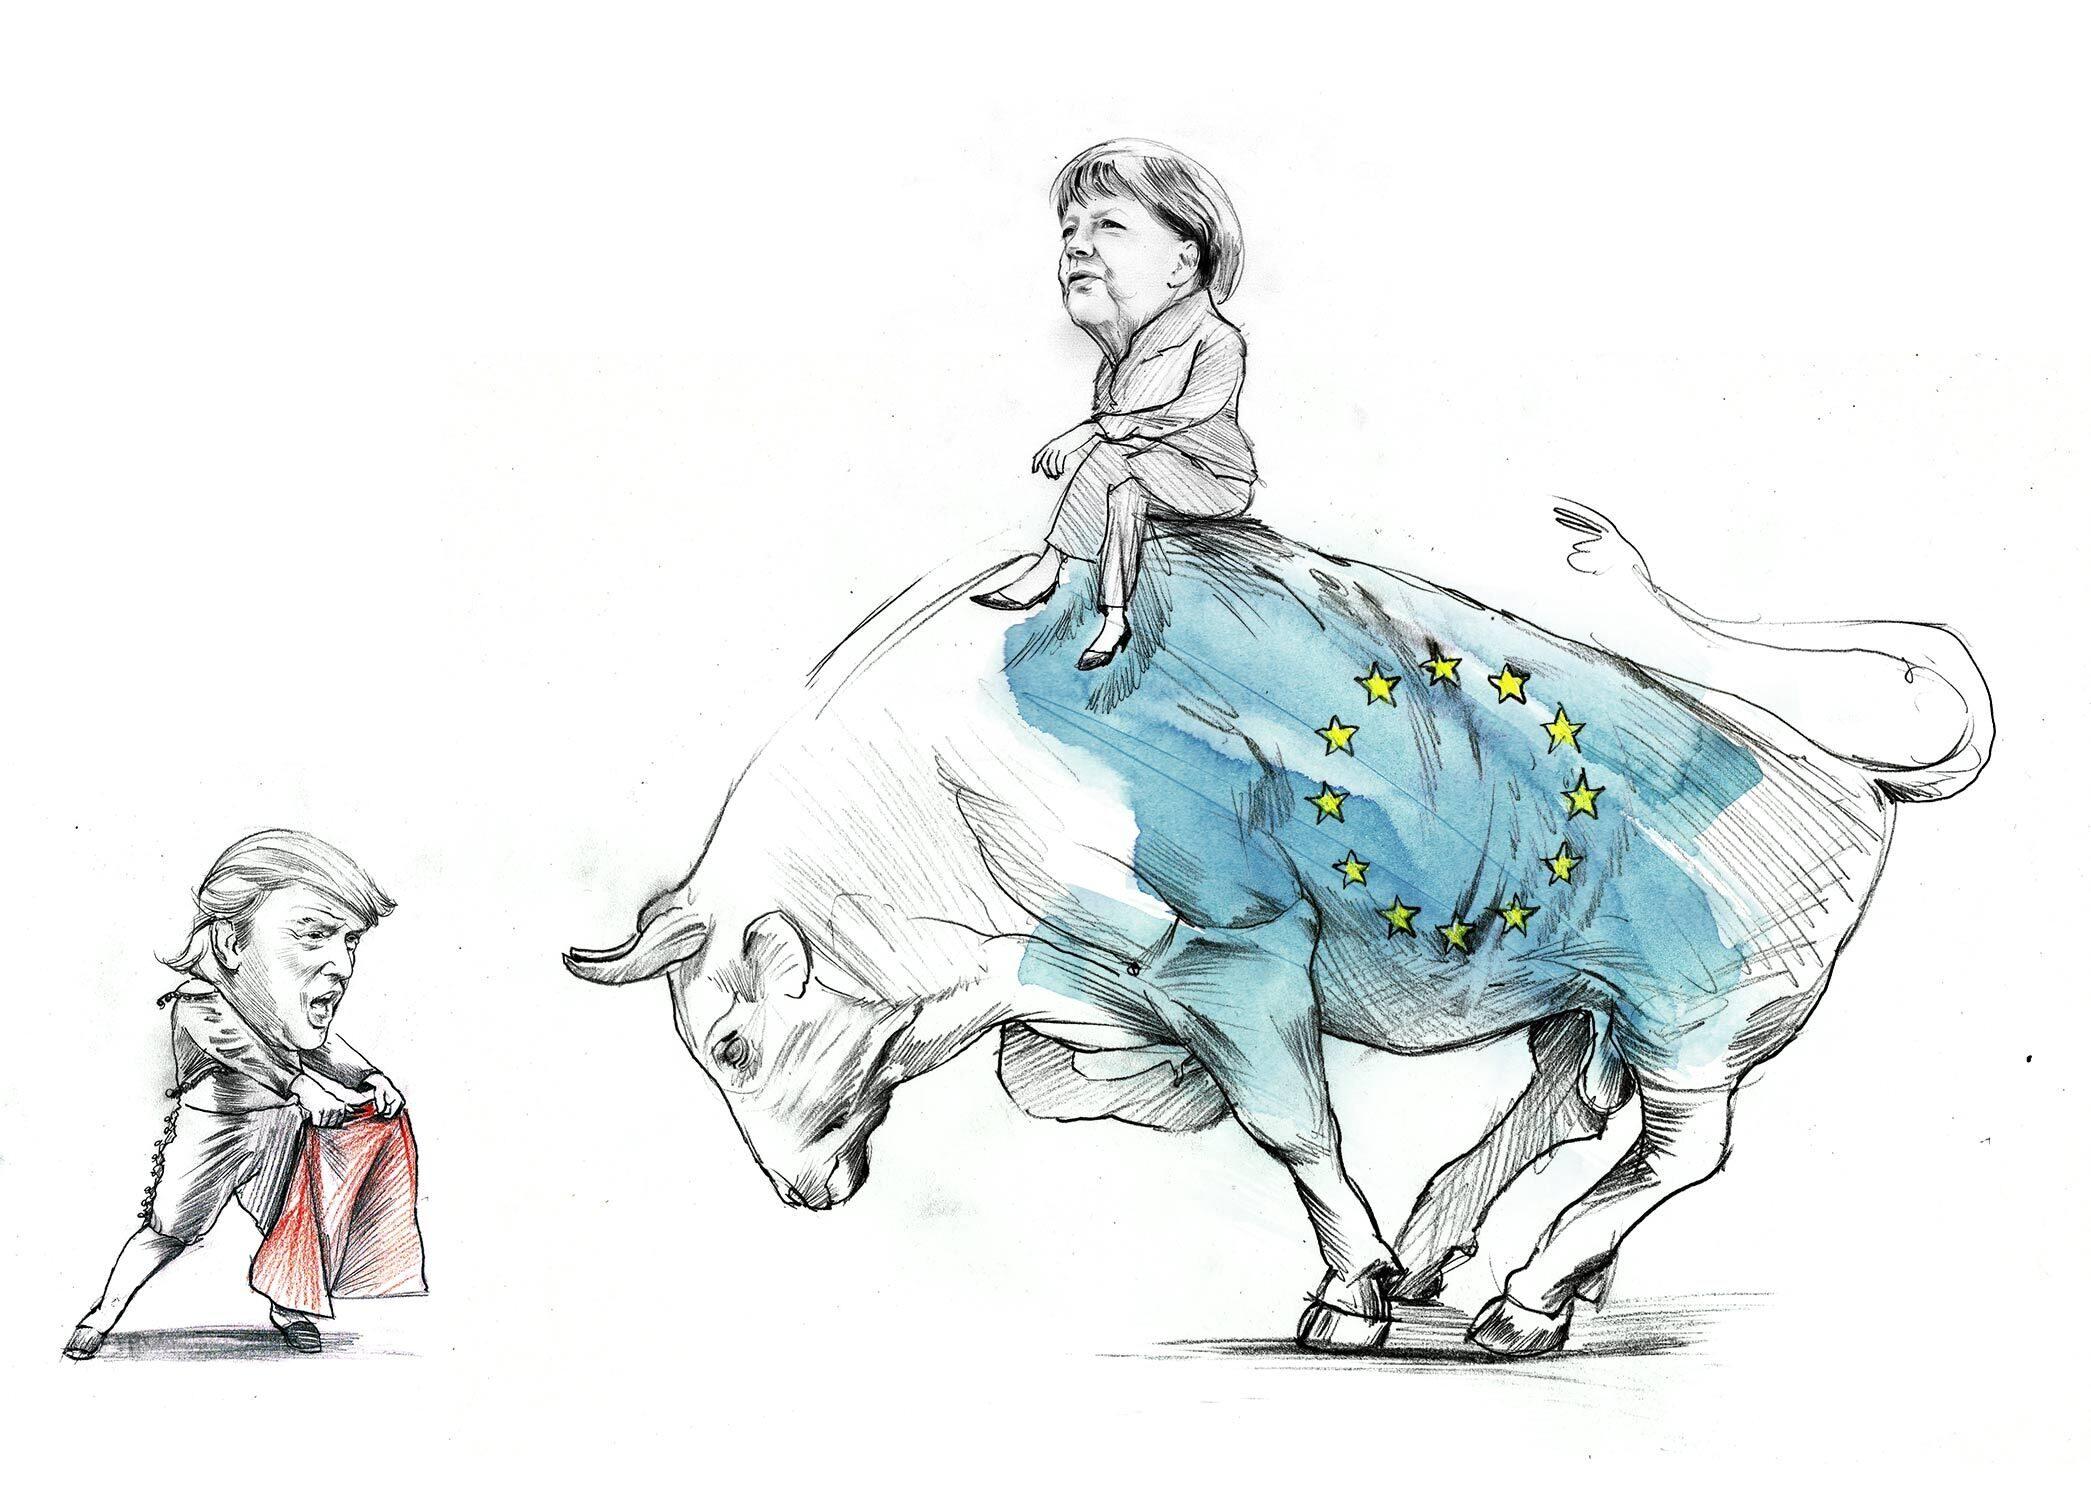 Skizze Trump Merkel Illustration die Zeit - Kornel Illustration | Kornel Stadler portfolio